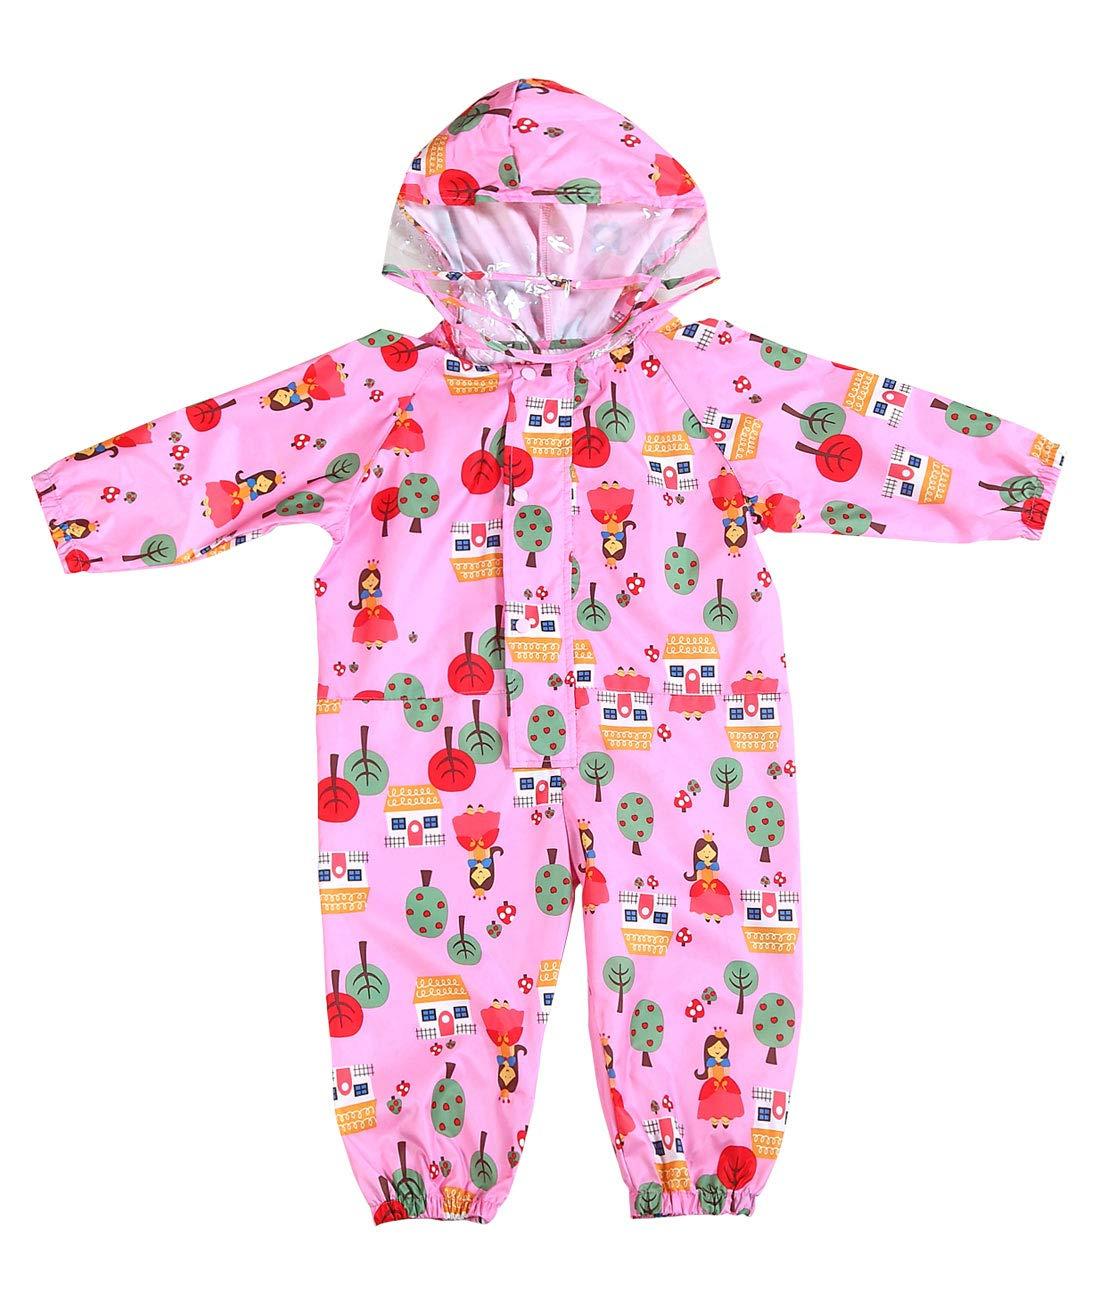 Happy Cherry Kids One Piece Rainsuits Waterproof Outerwear Rain Coat Jacket Cartoon Rain Slicker for Boys Girls